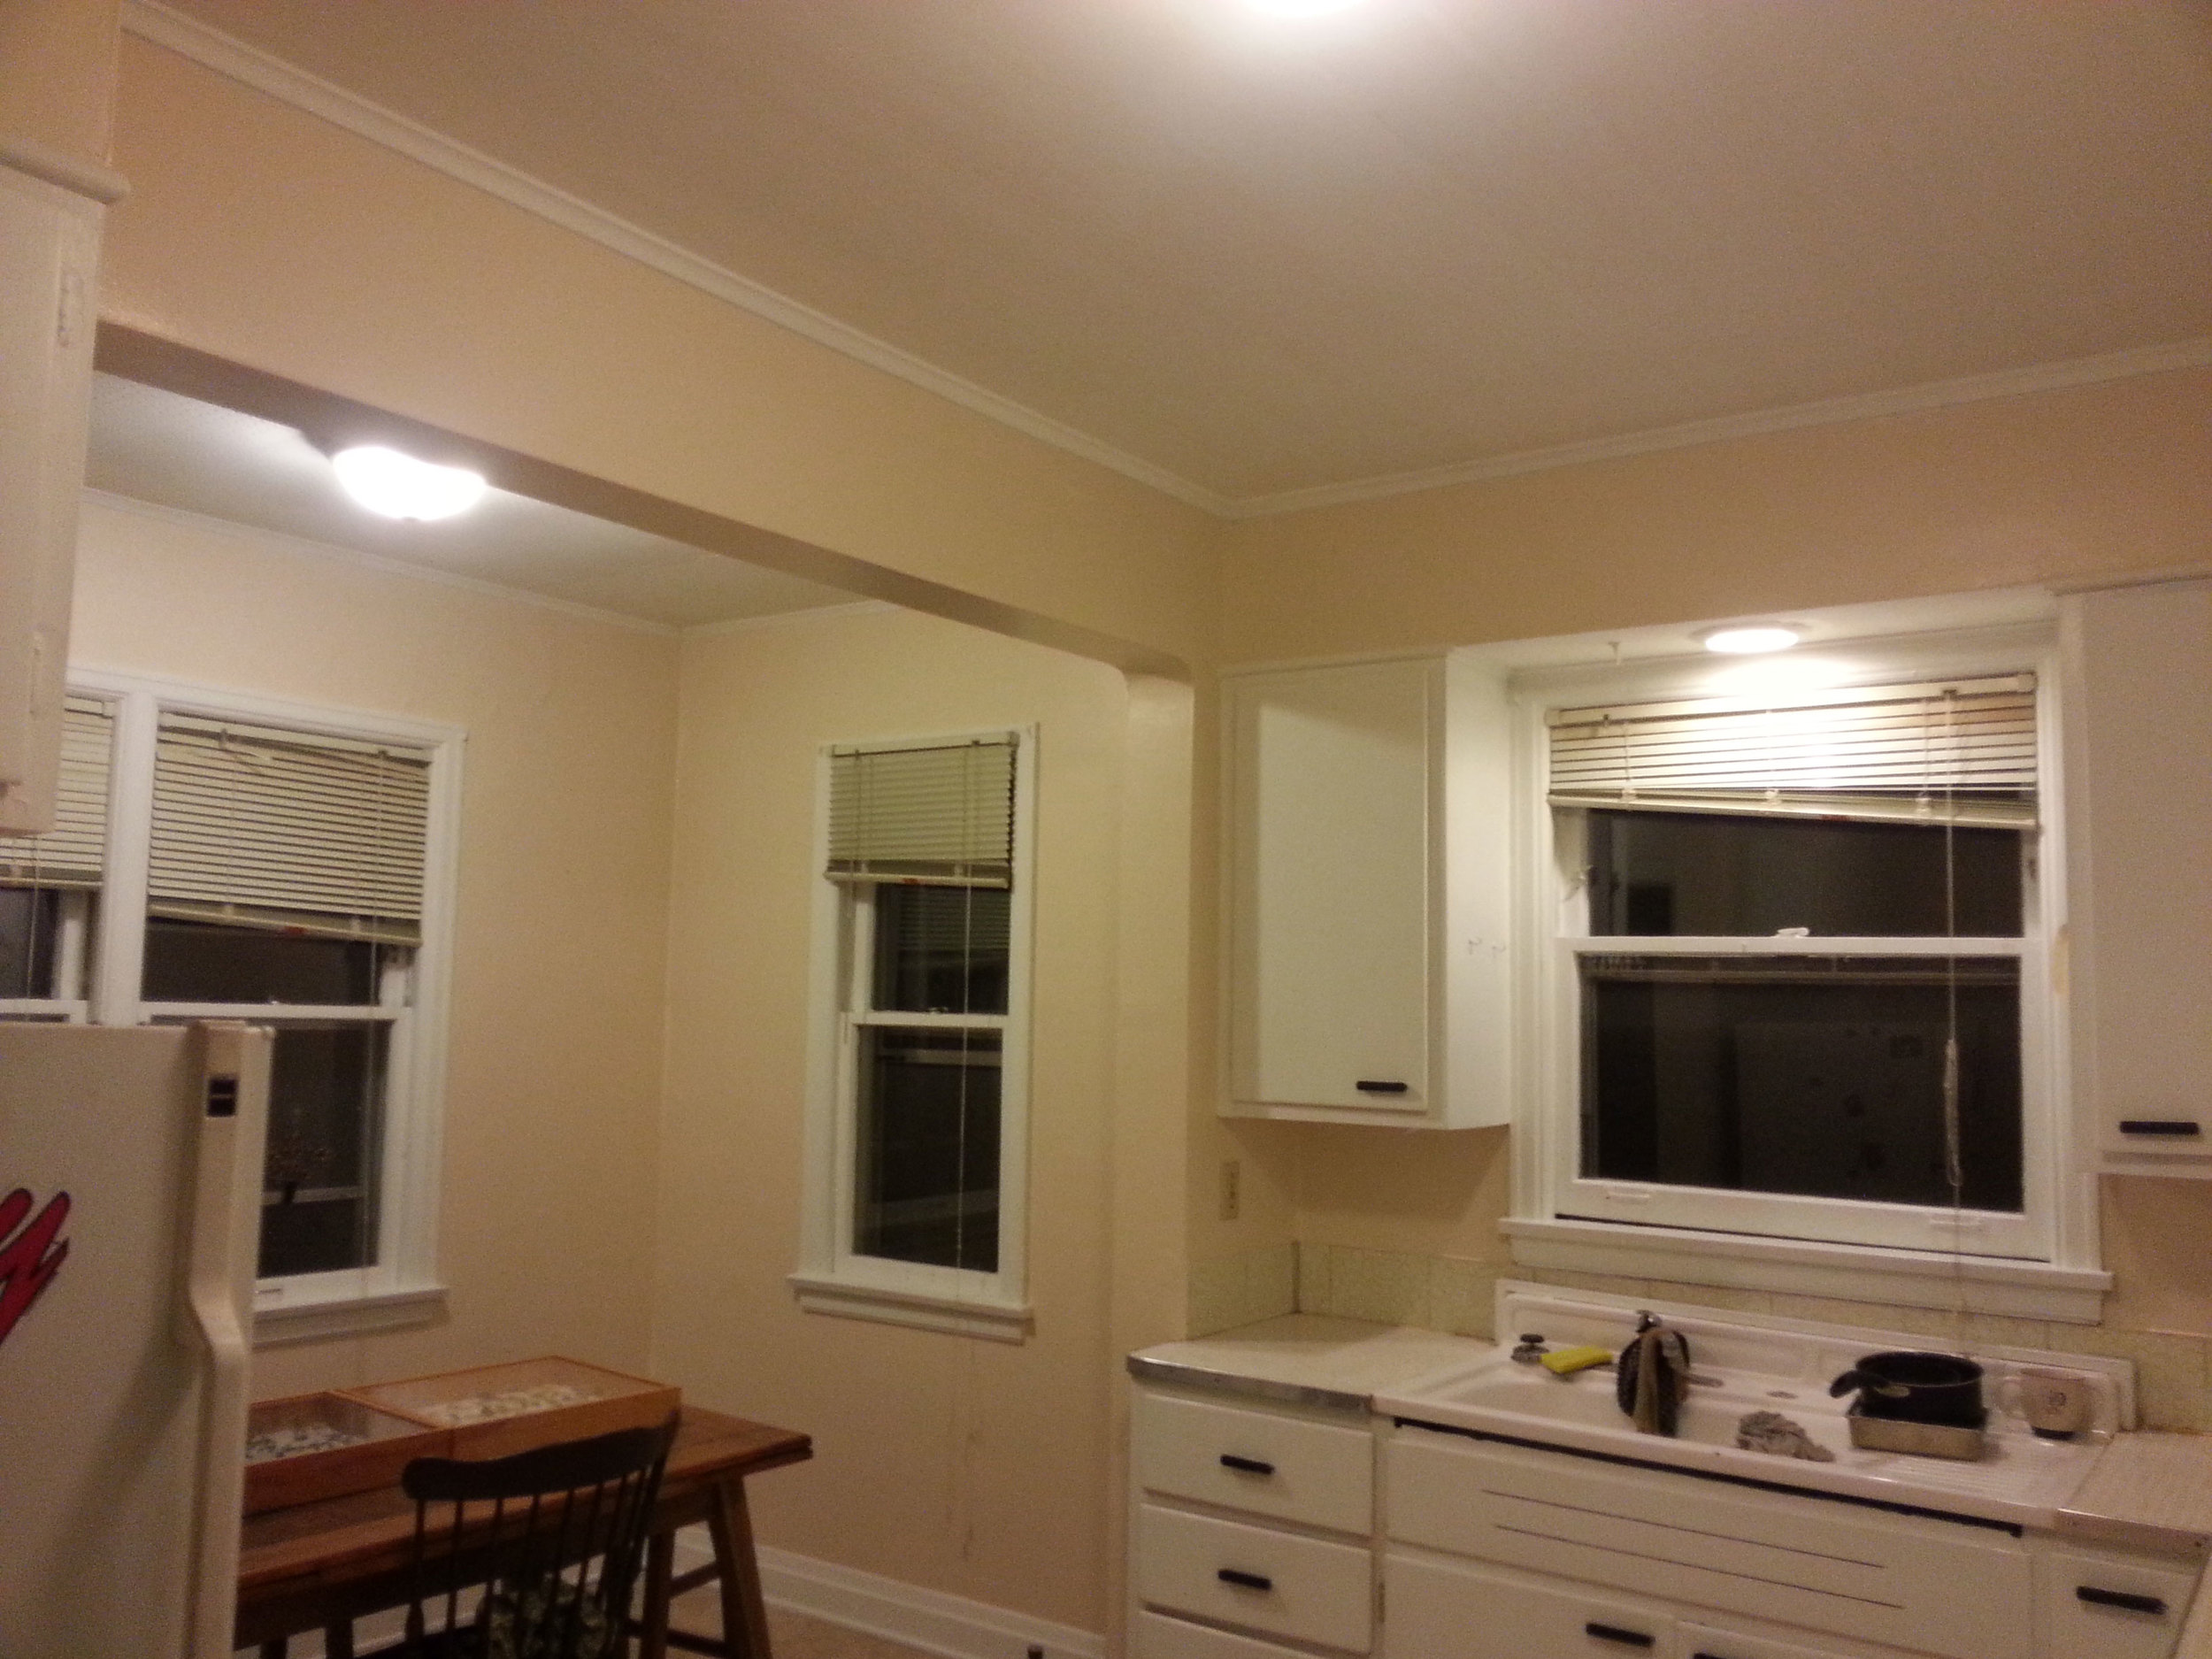 UW-kitchen-megna-painting.jpg